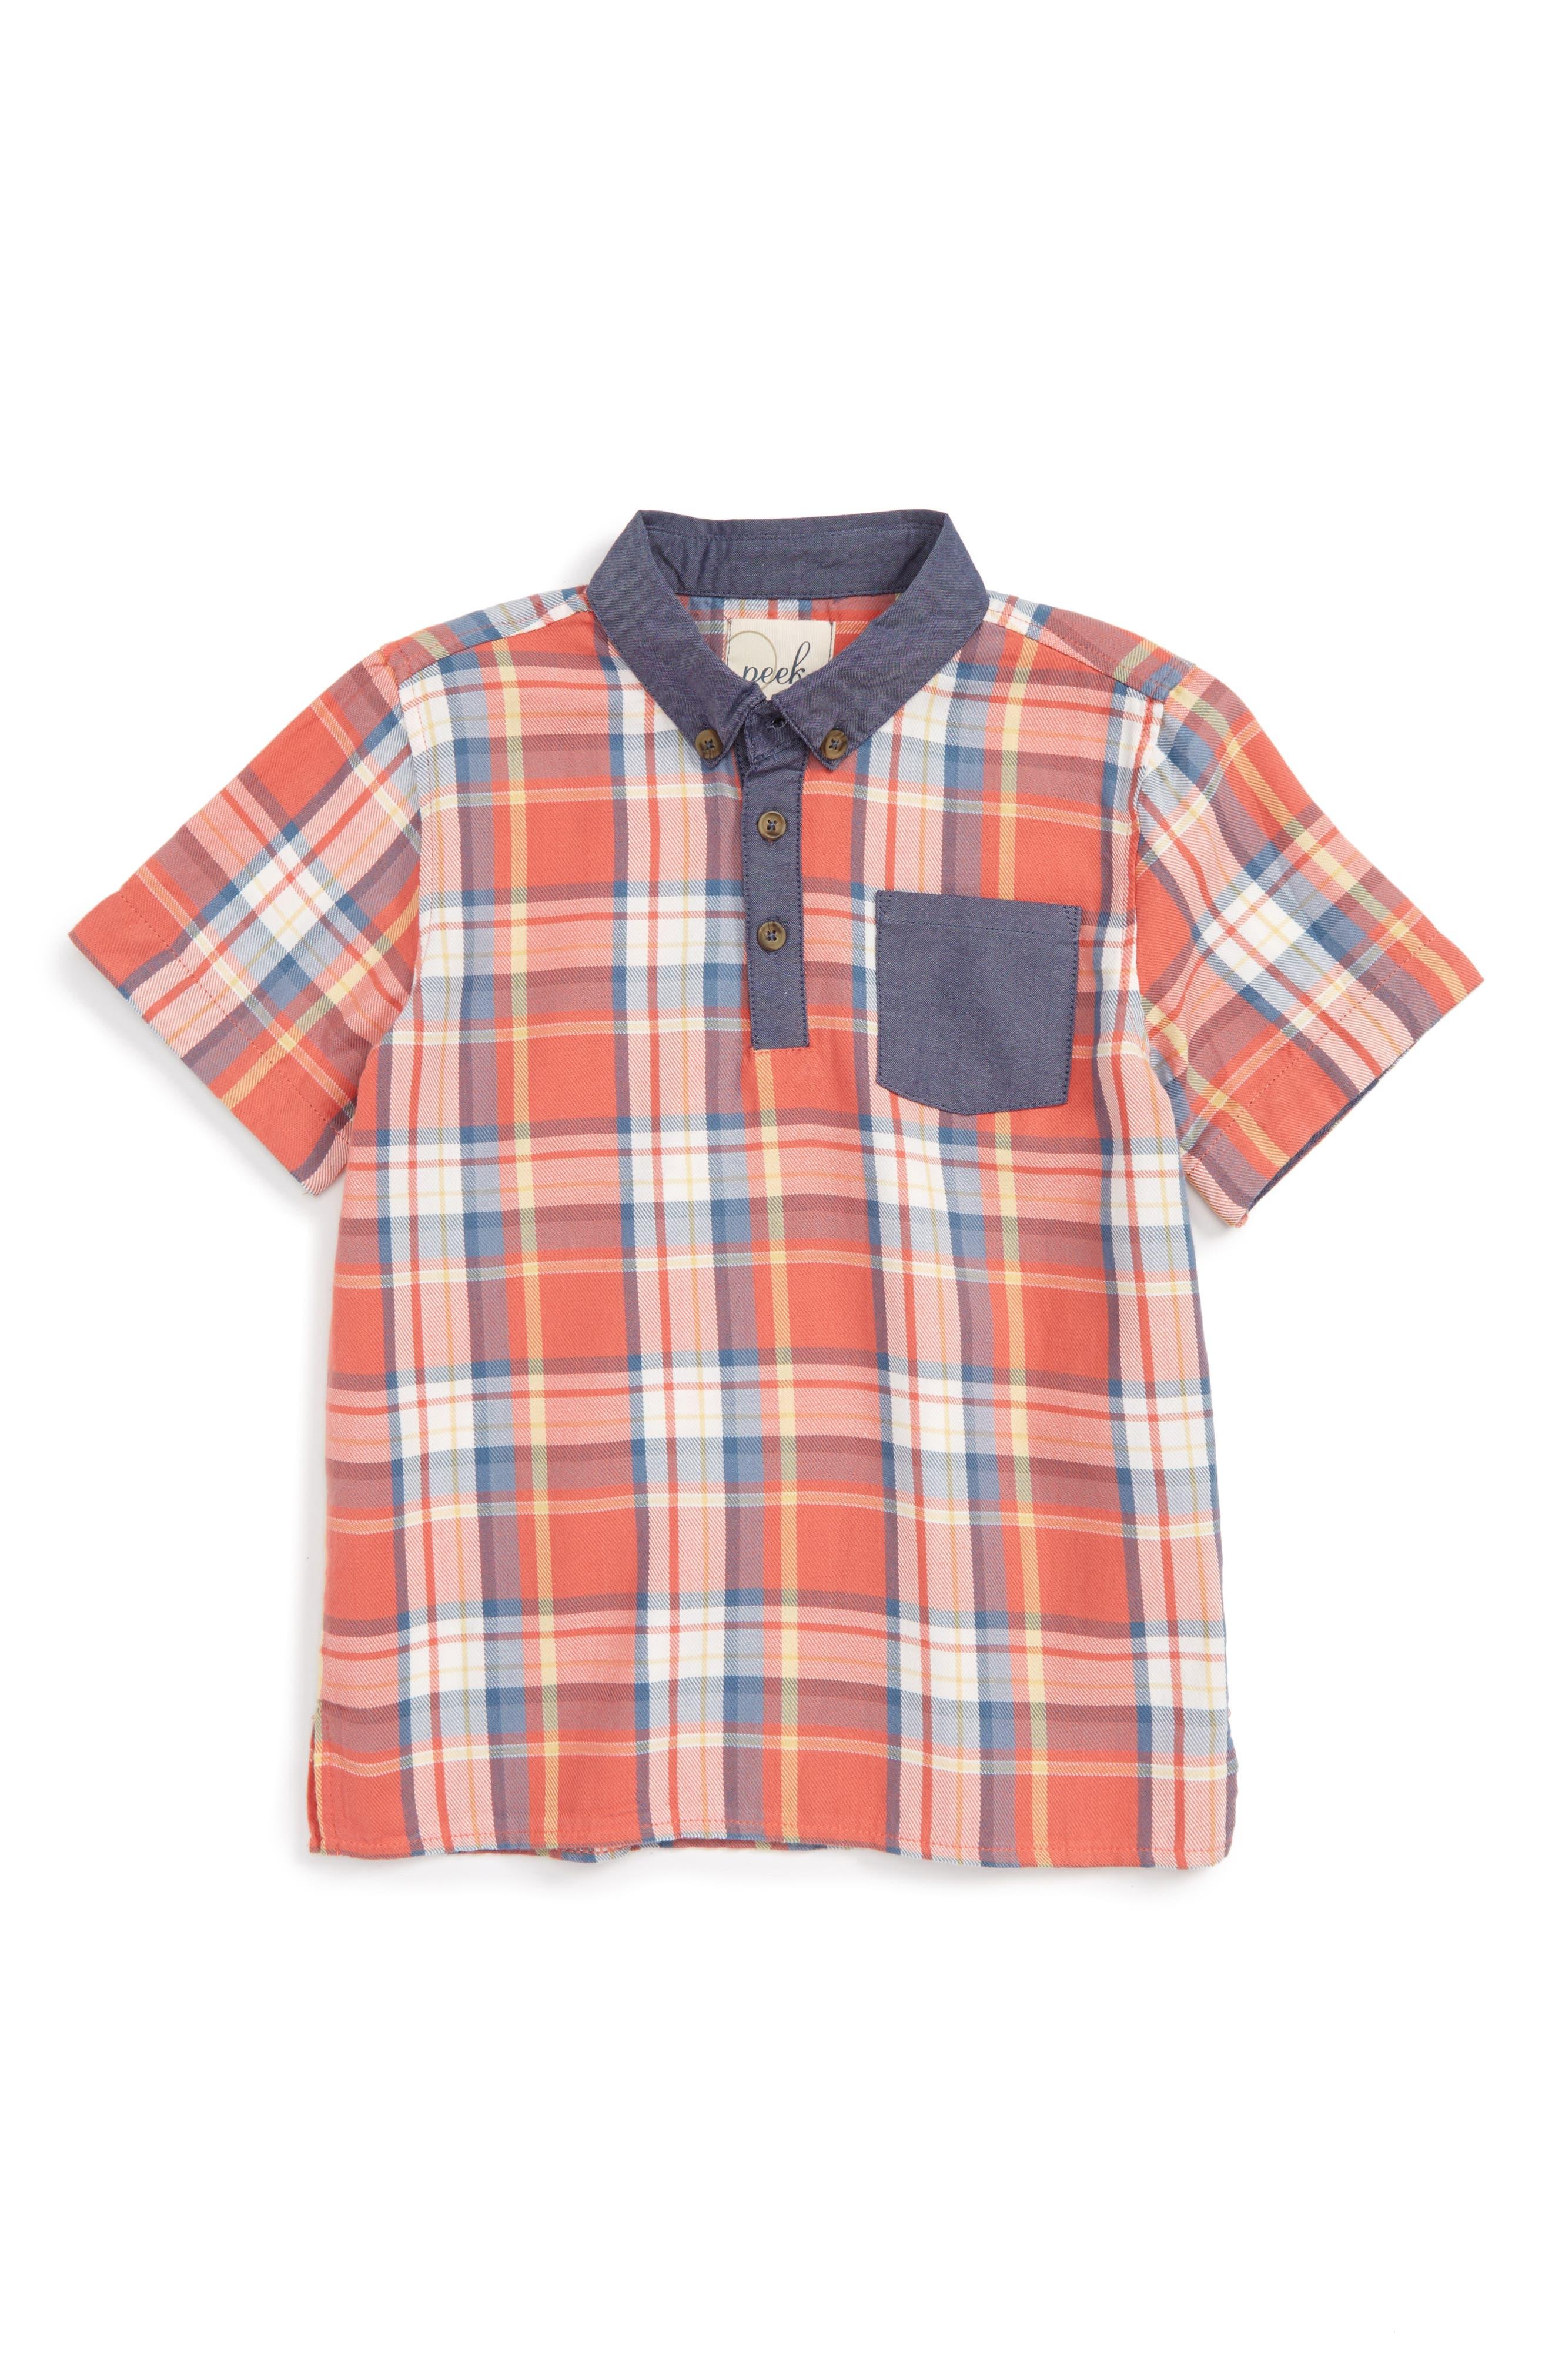 Peek Plaid Shirt (Toddler Boys, Little Boys & Big Boys)